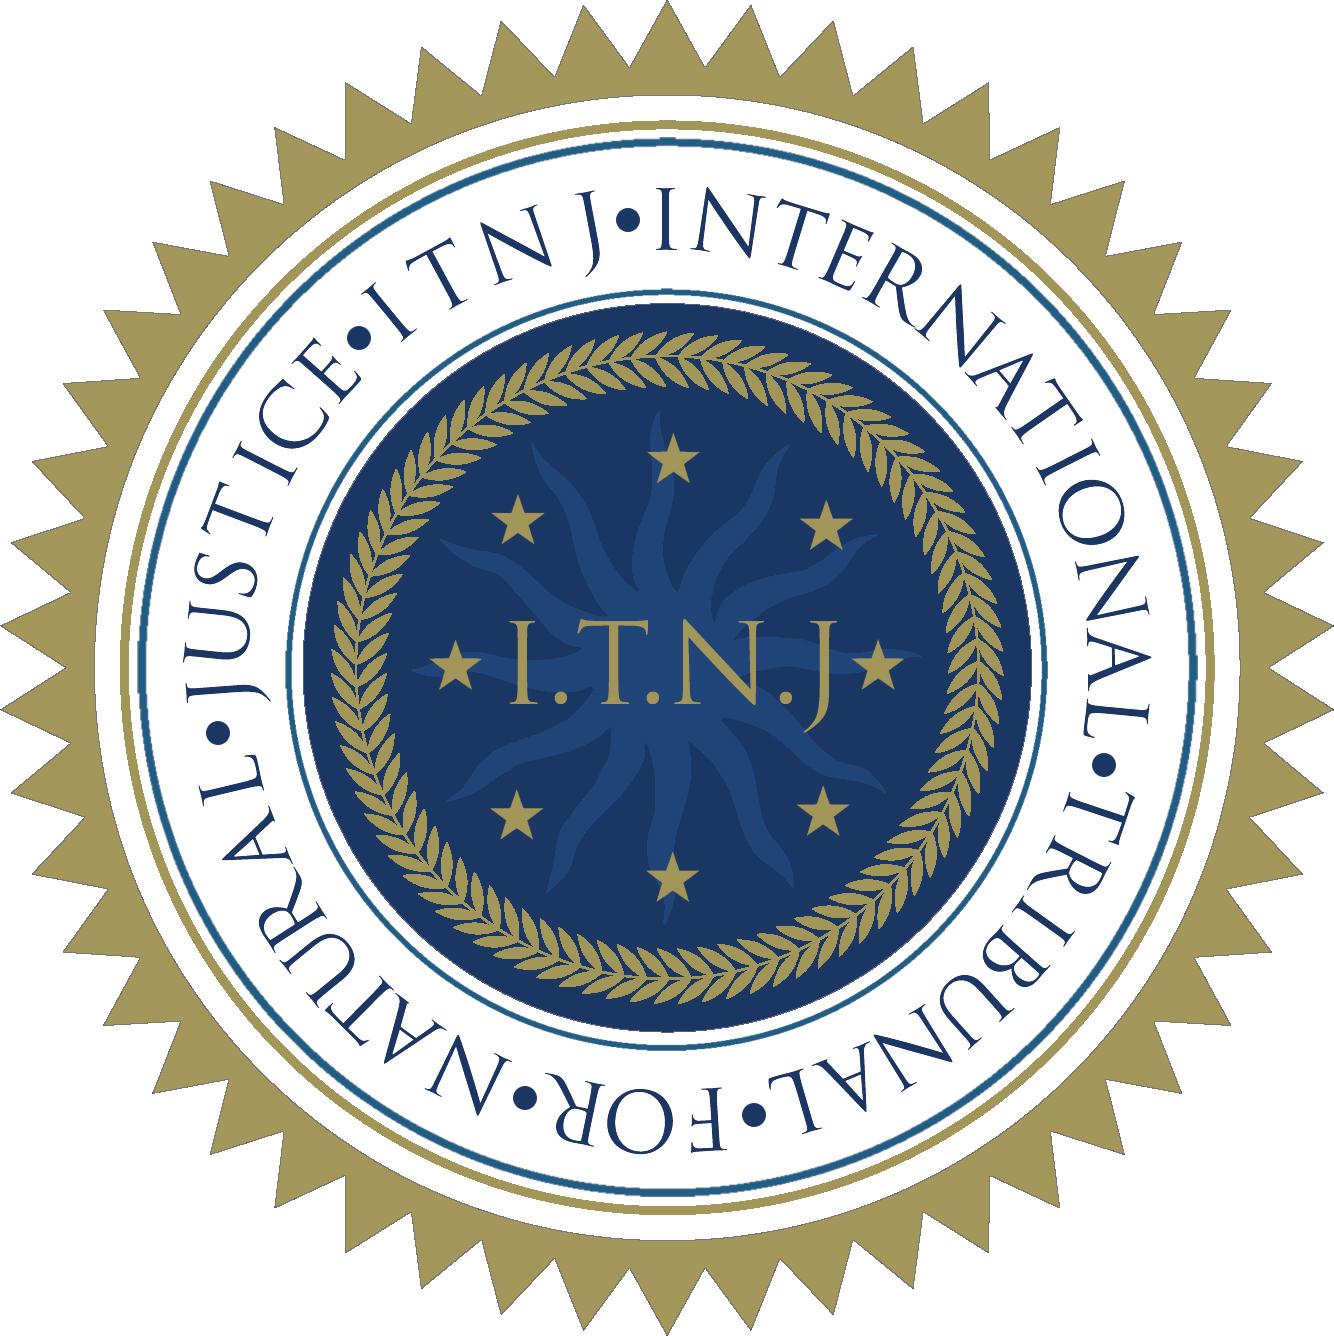 ITNJ logo